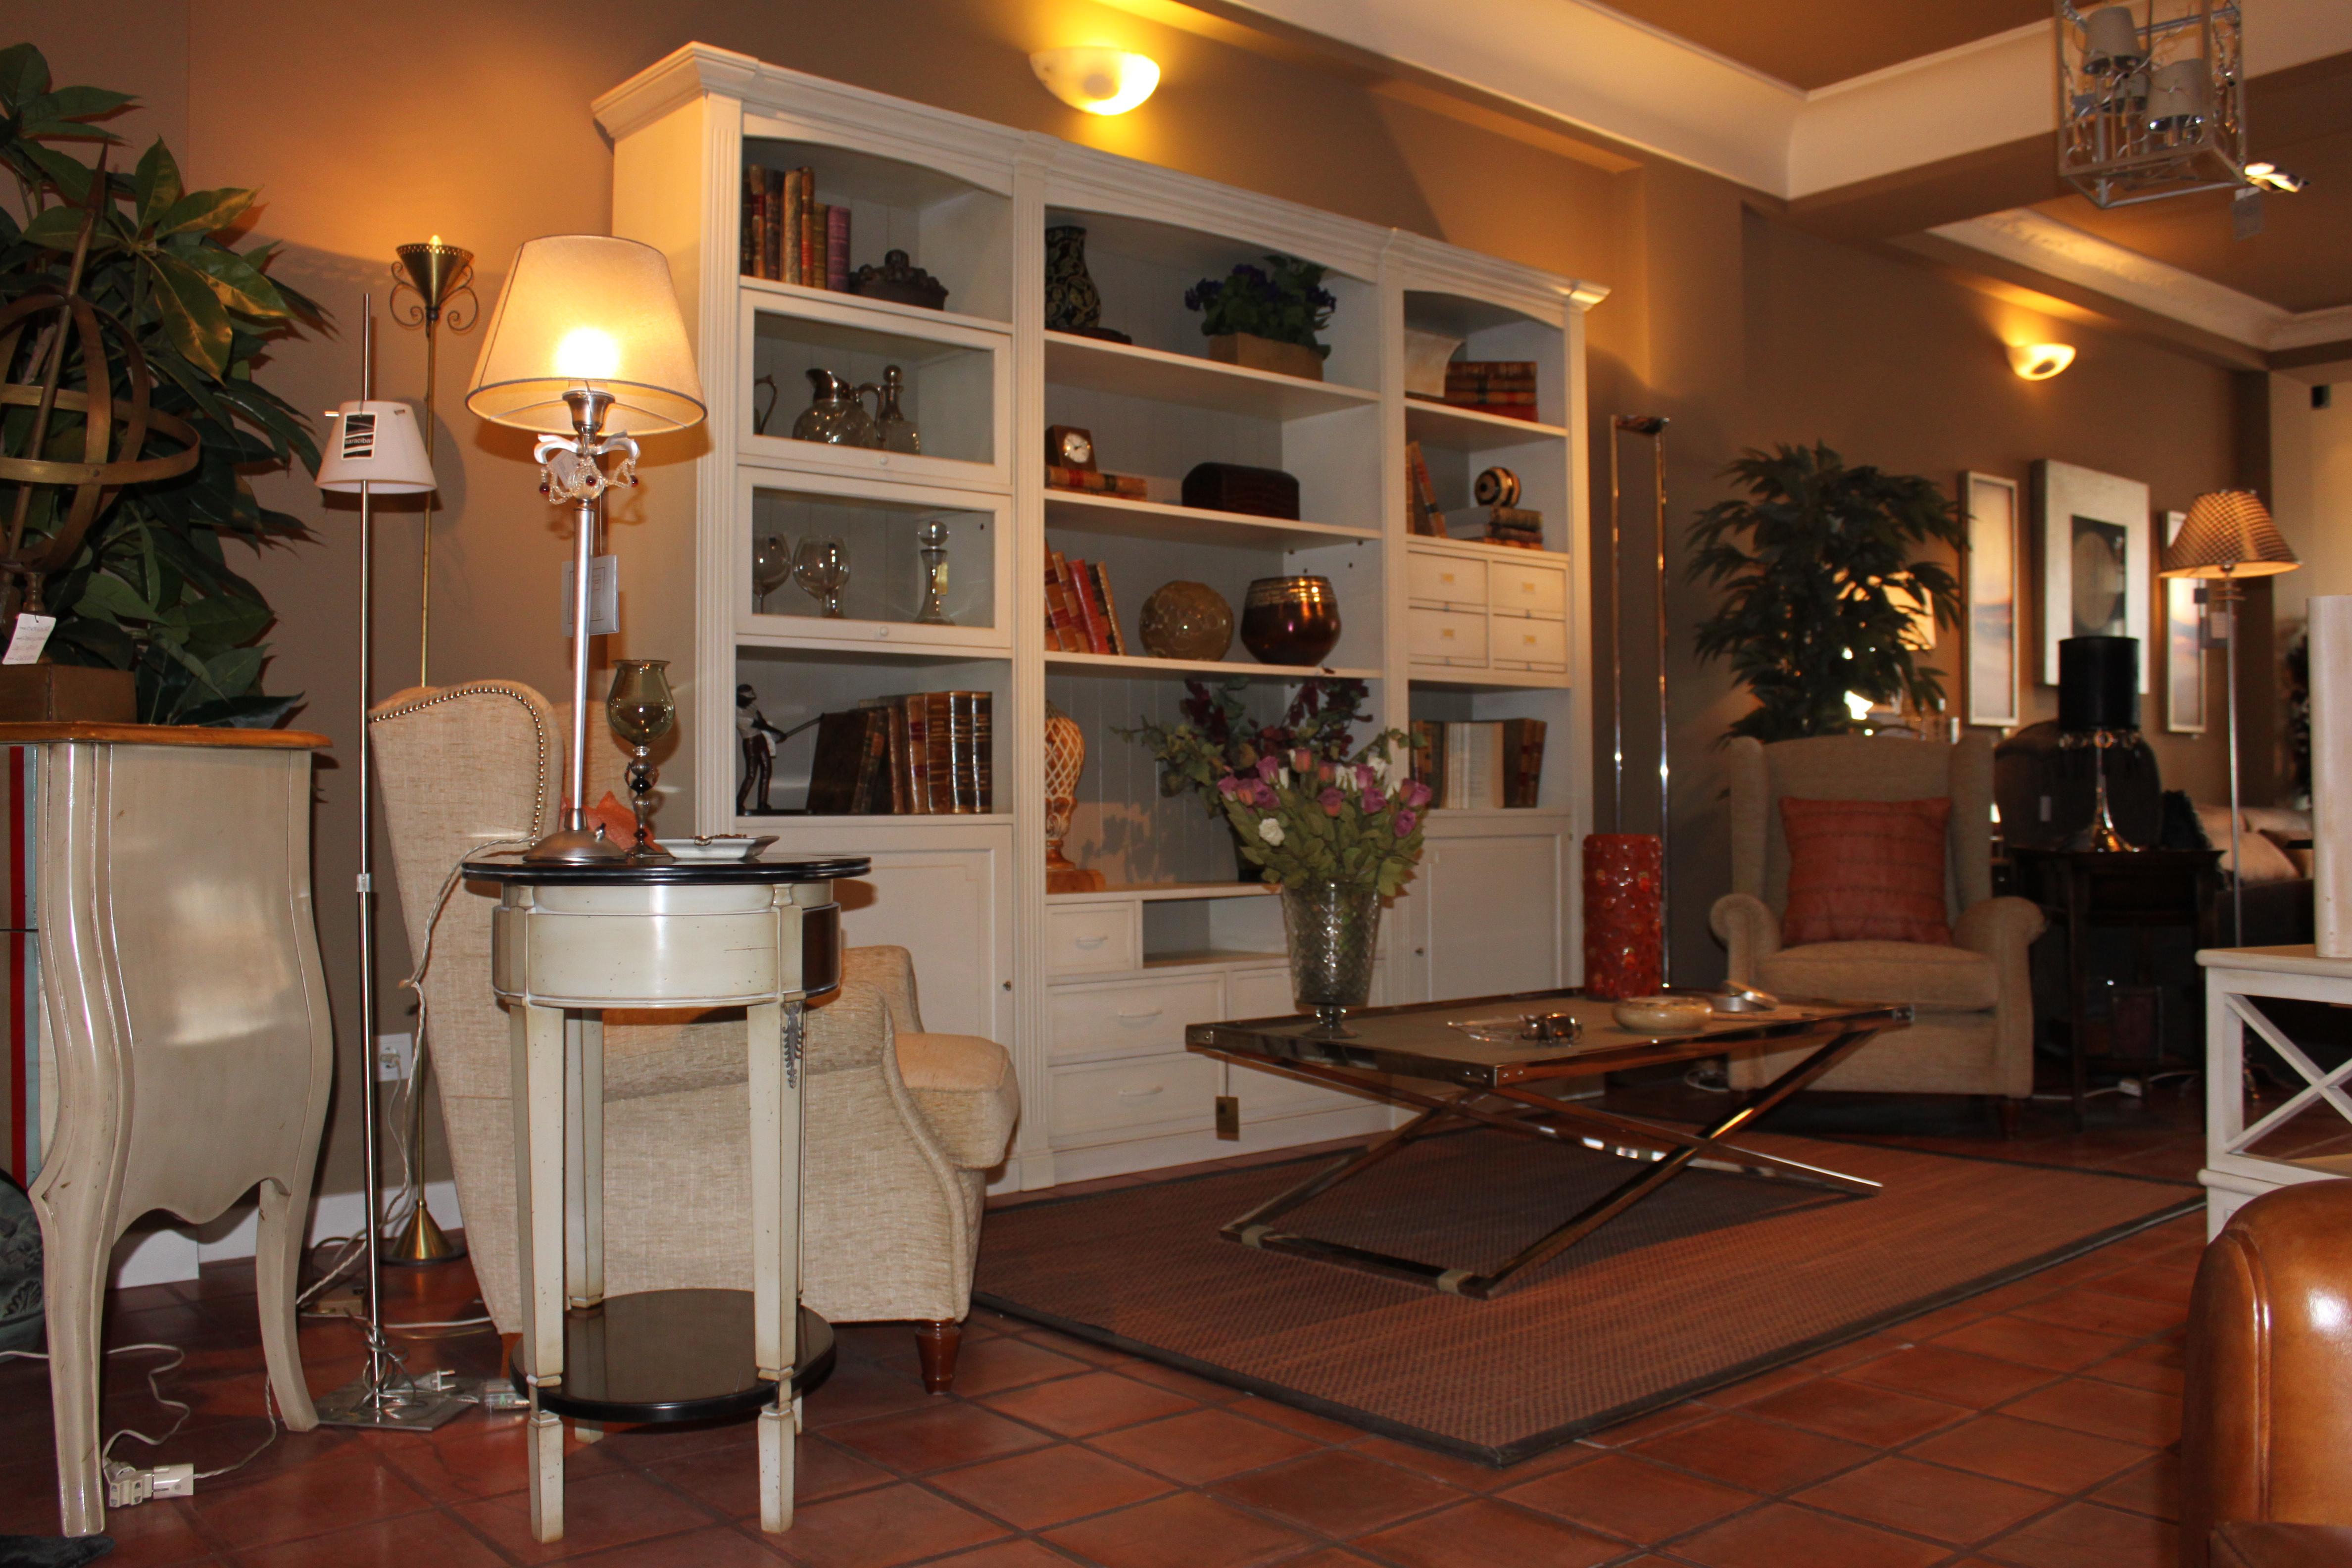 Muebles decoraci n vitoria - Decoracion vitoria ...